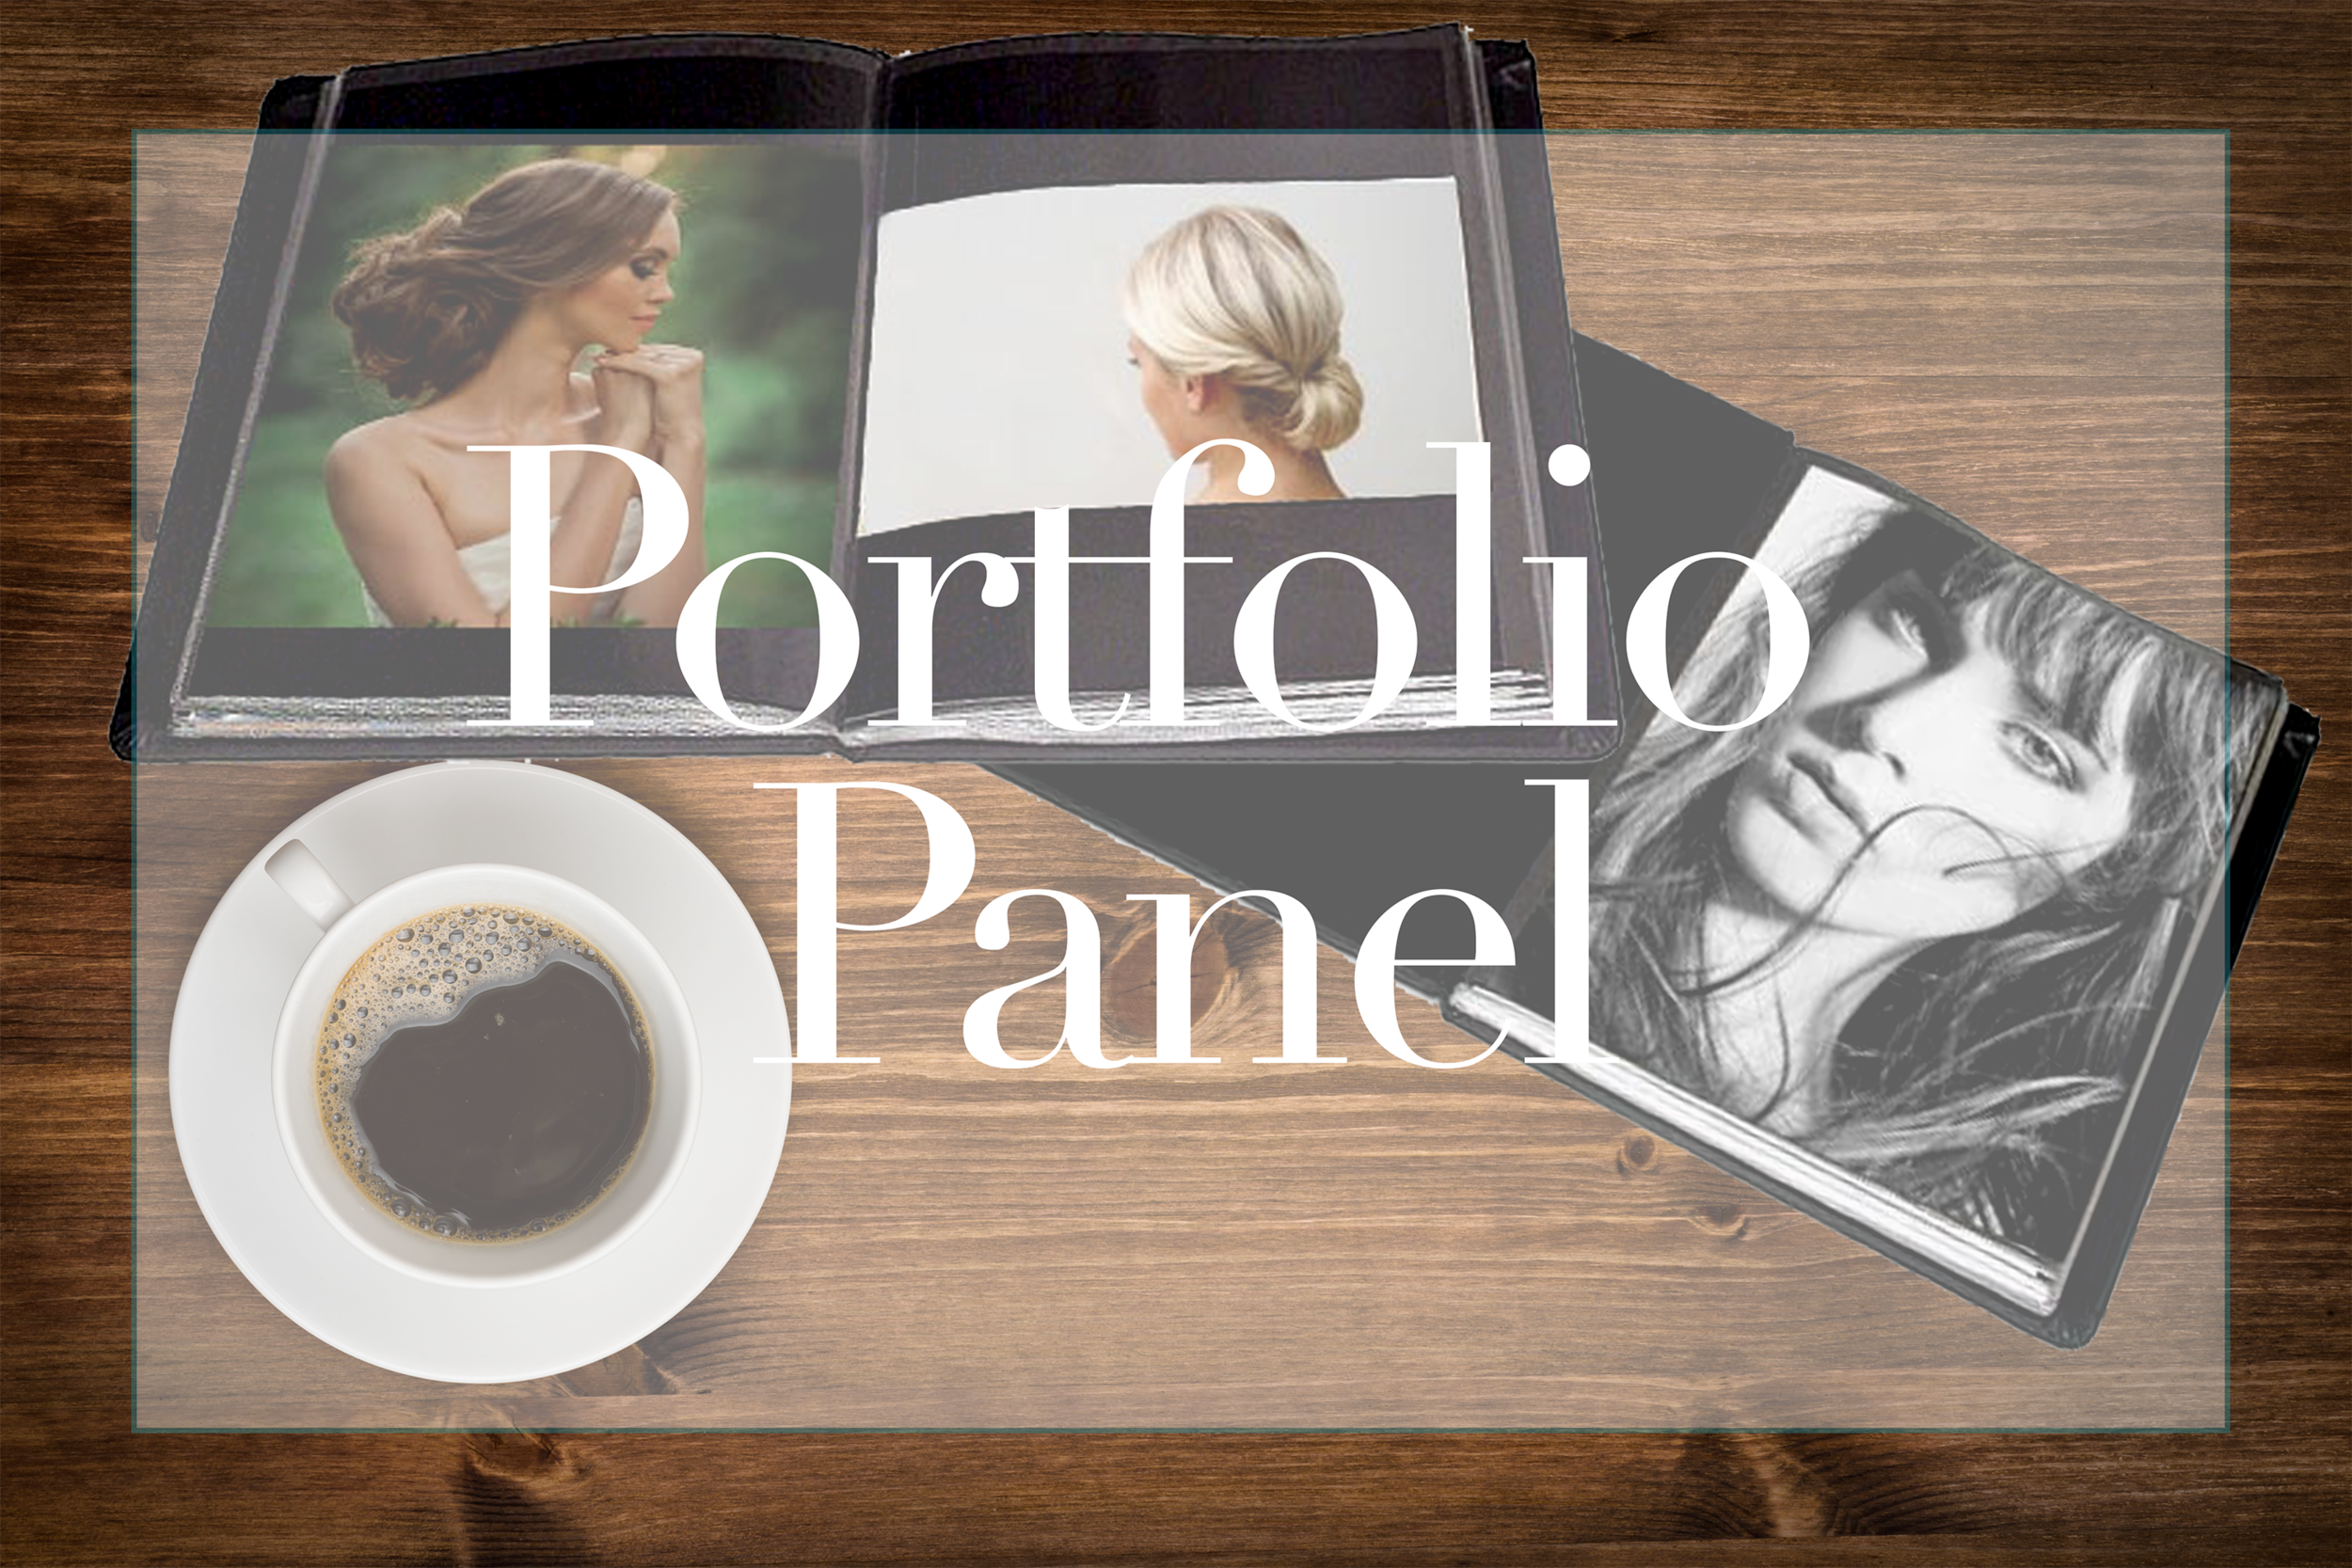 portfolio_panel_small.png